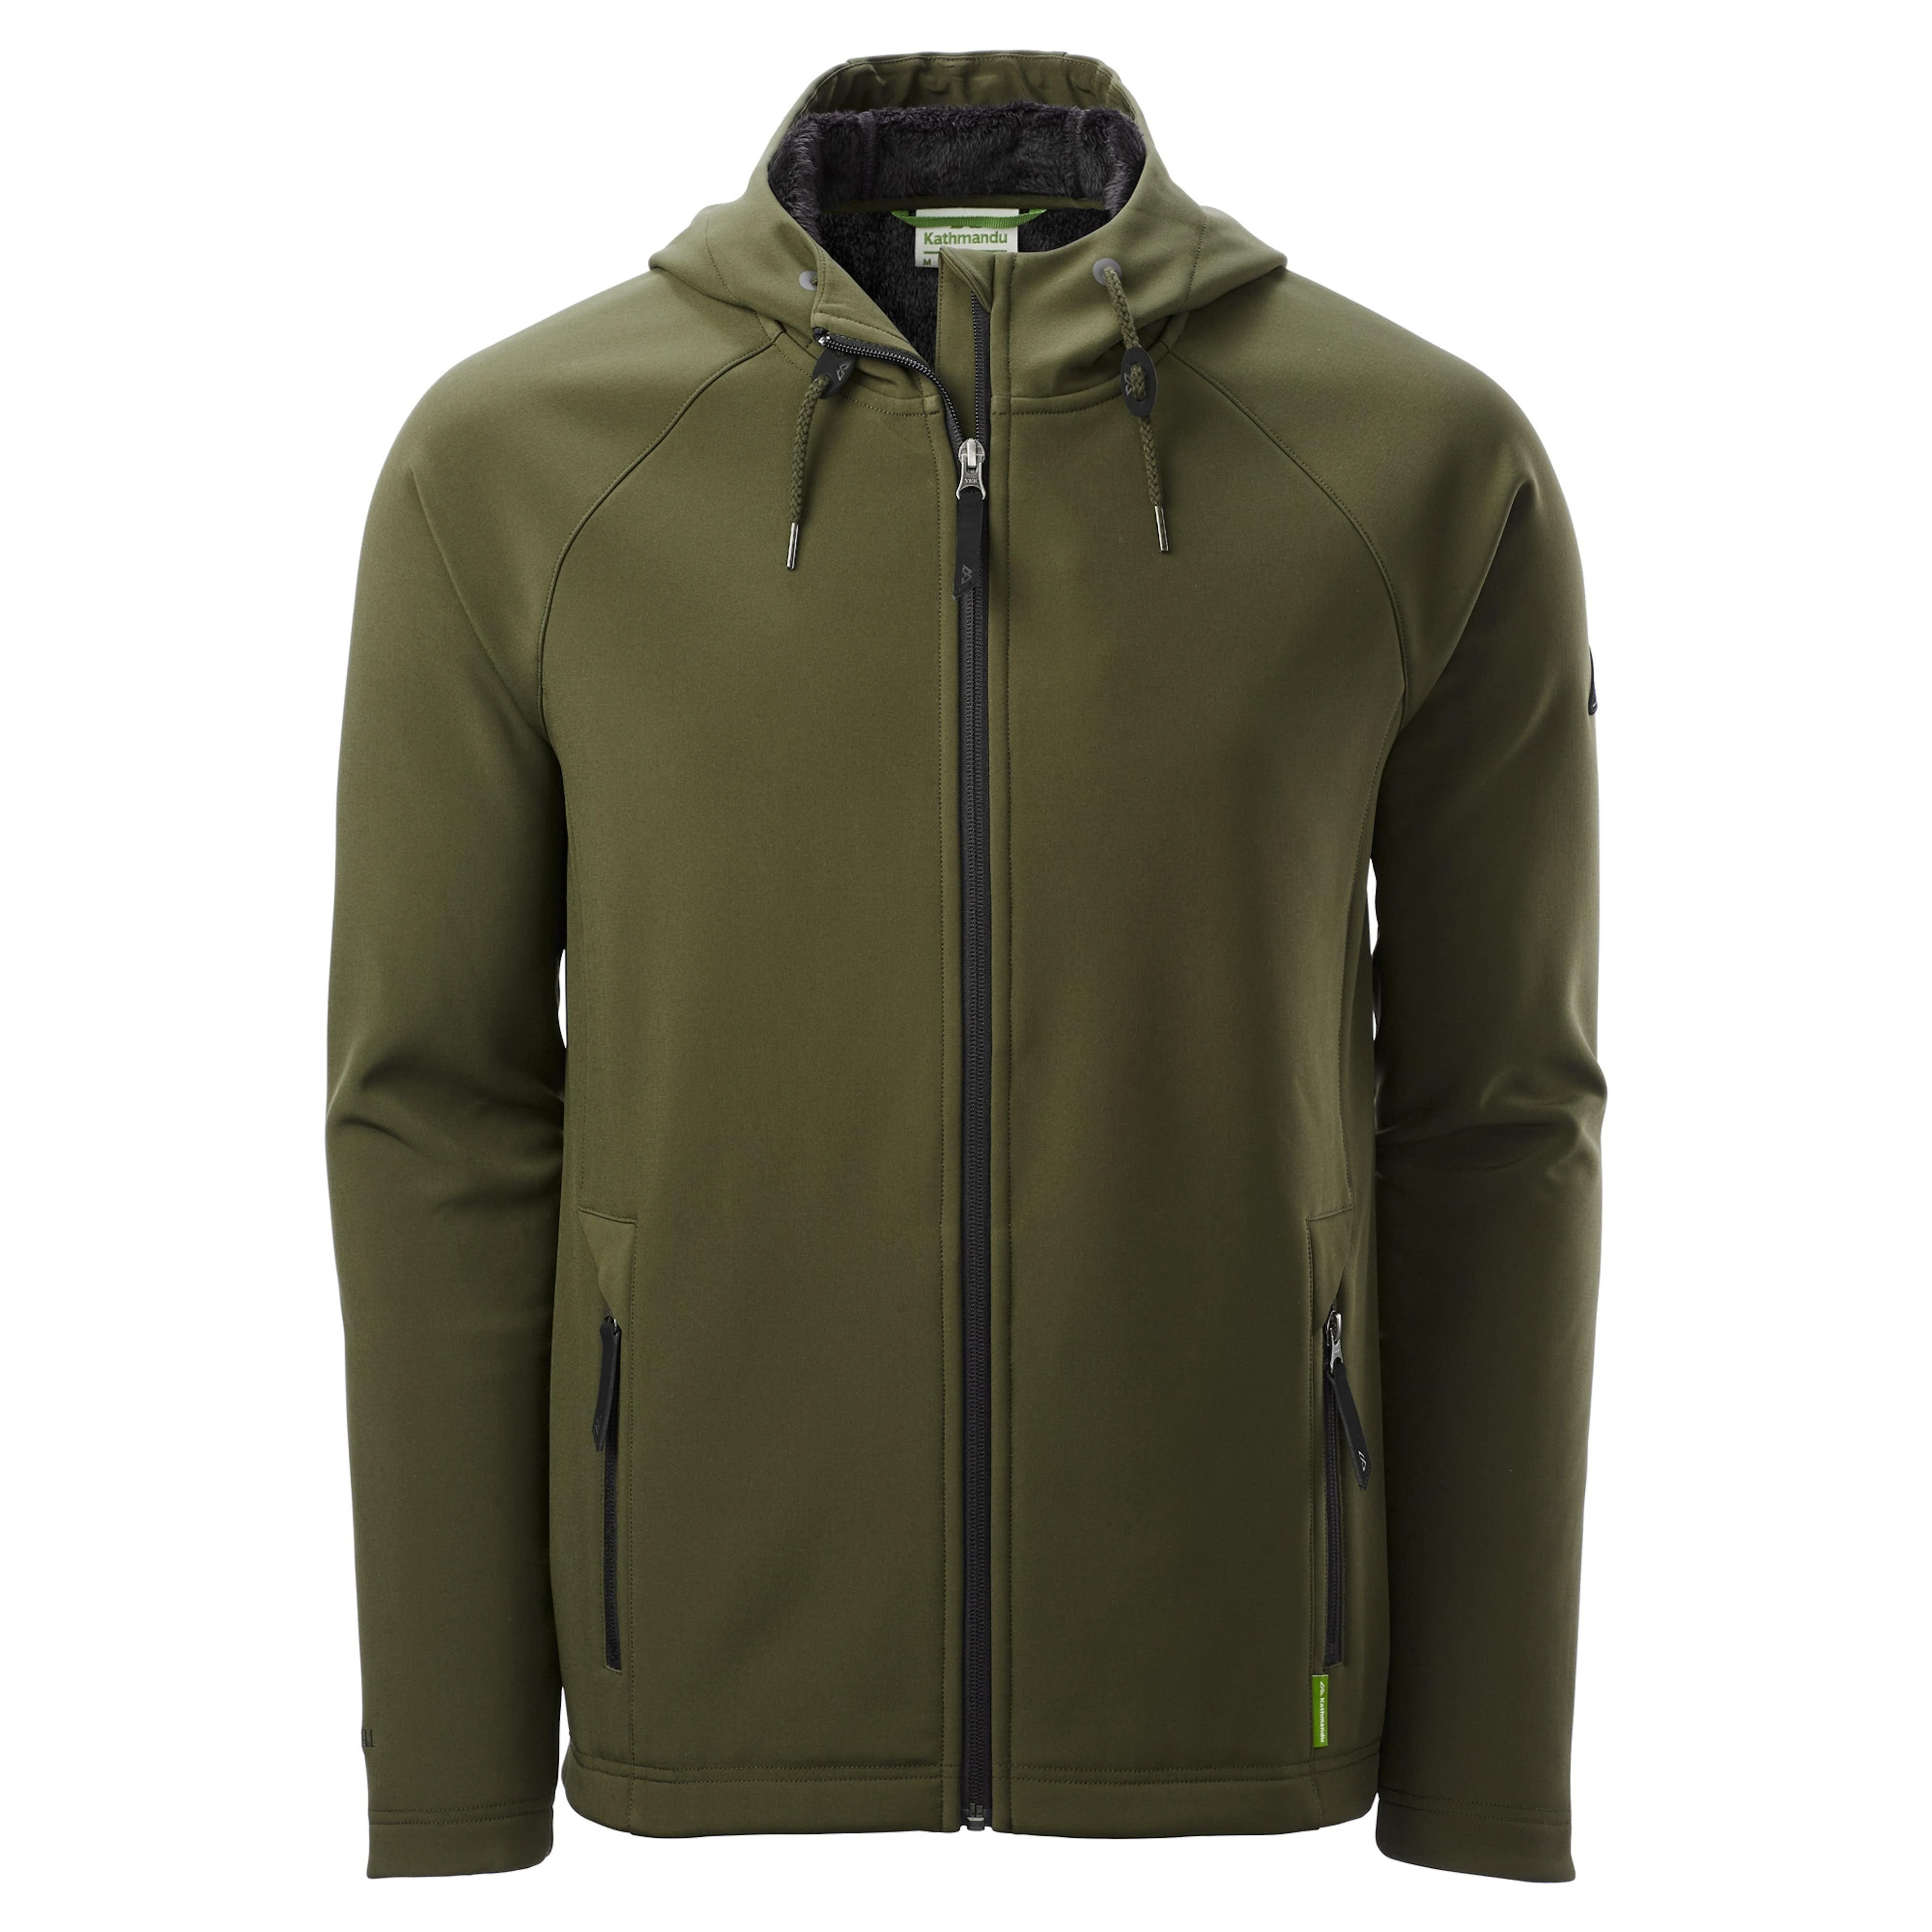 49250250e74 Mens Jackets for Sale Online | Winter Coats for Men in NZ